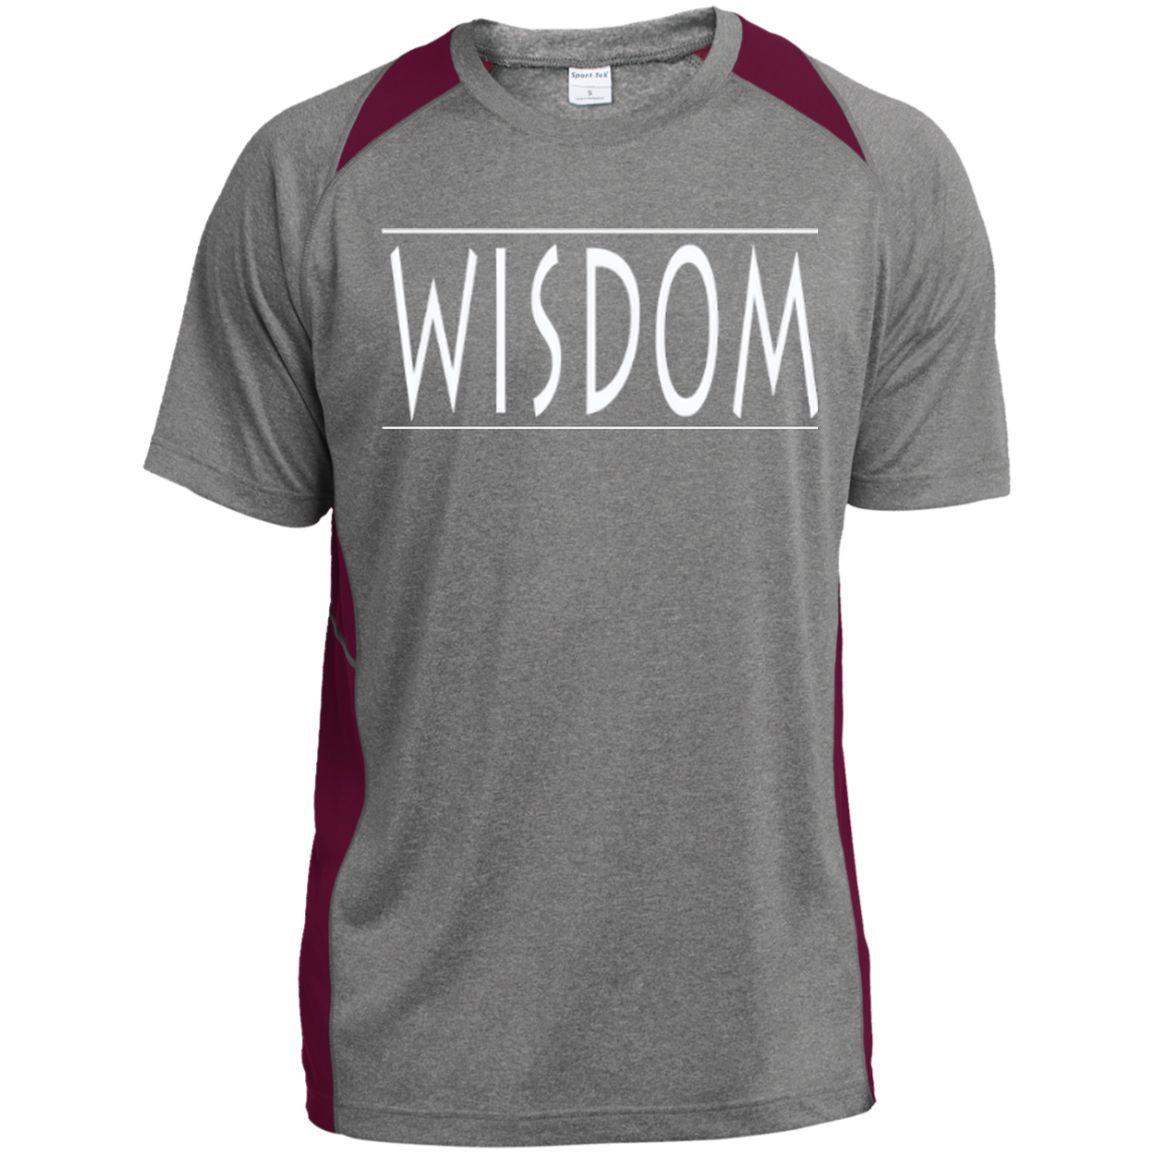 Wisdom /Custom Printed Heather Colorblock Poly T-shirt